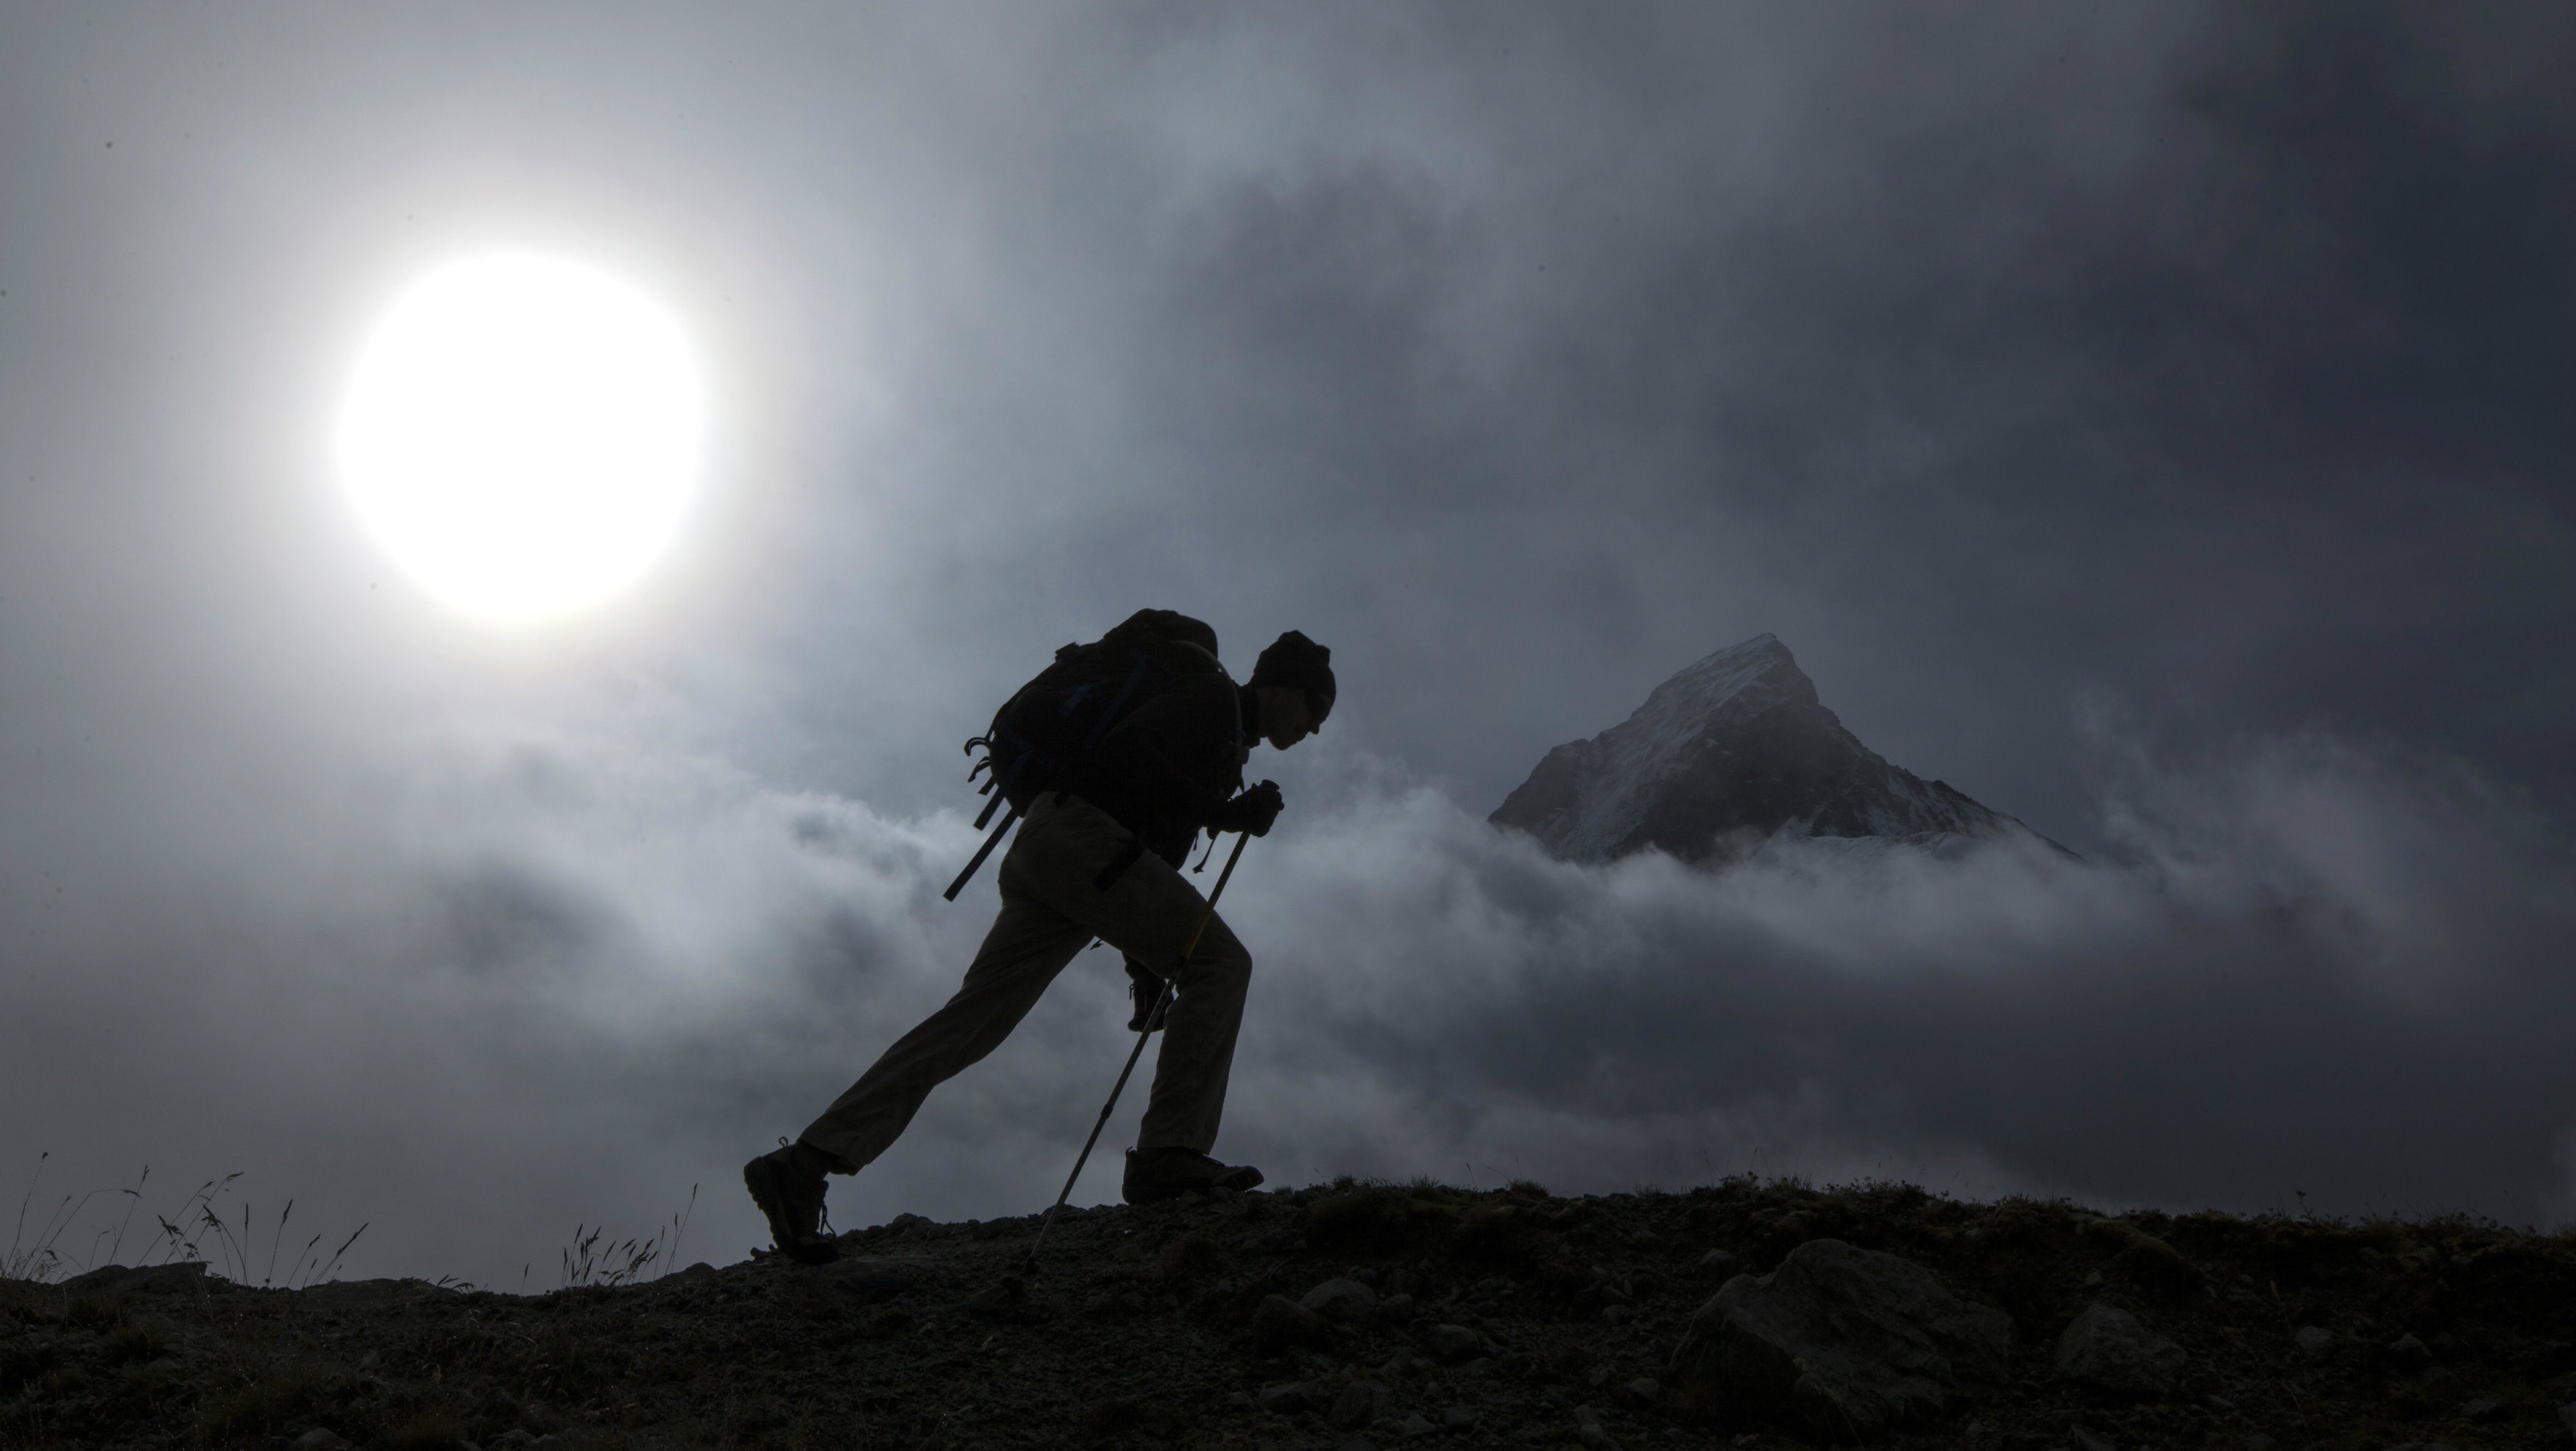 A hiker walks past the Matterhorn mountain at sunrise in the Swiss Alps near Zermatt September 11, 2013. Picture taken September 11, 2013.